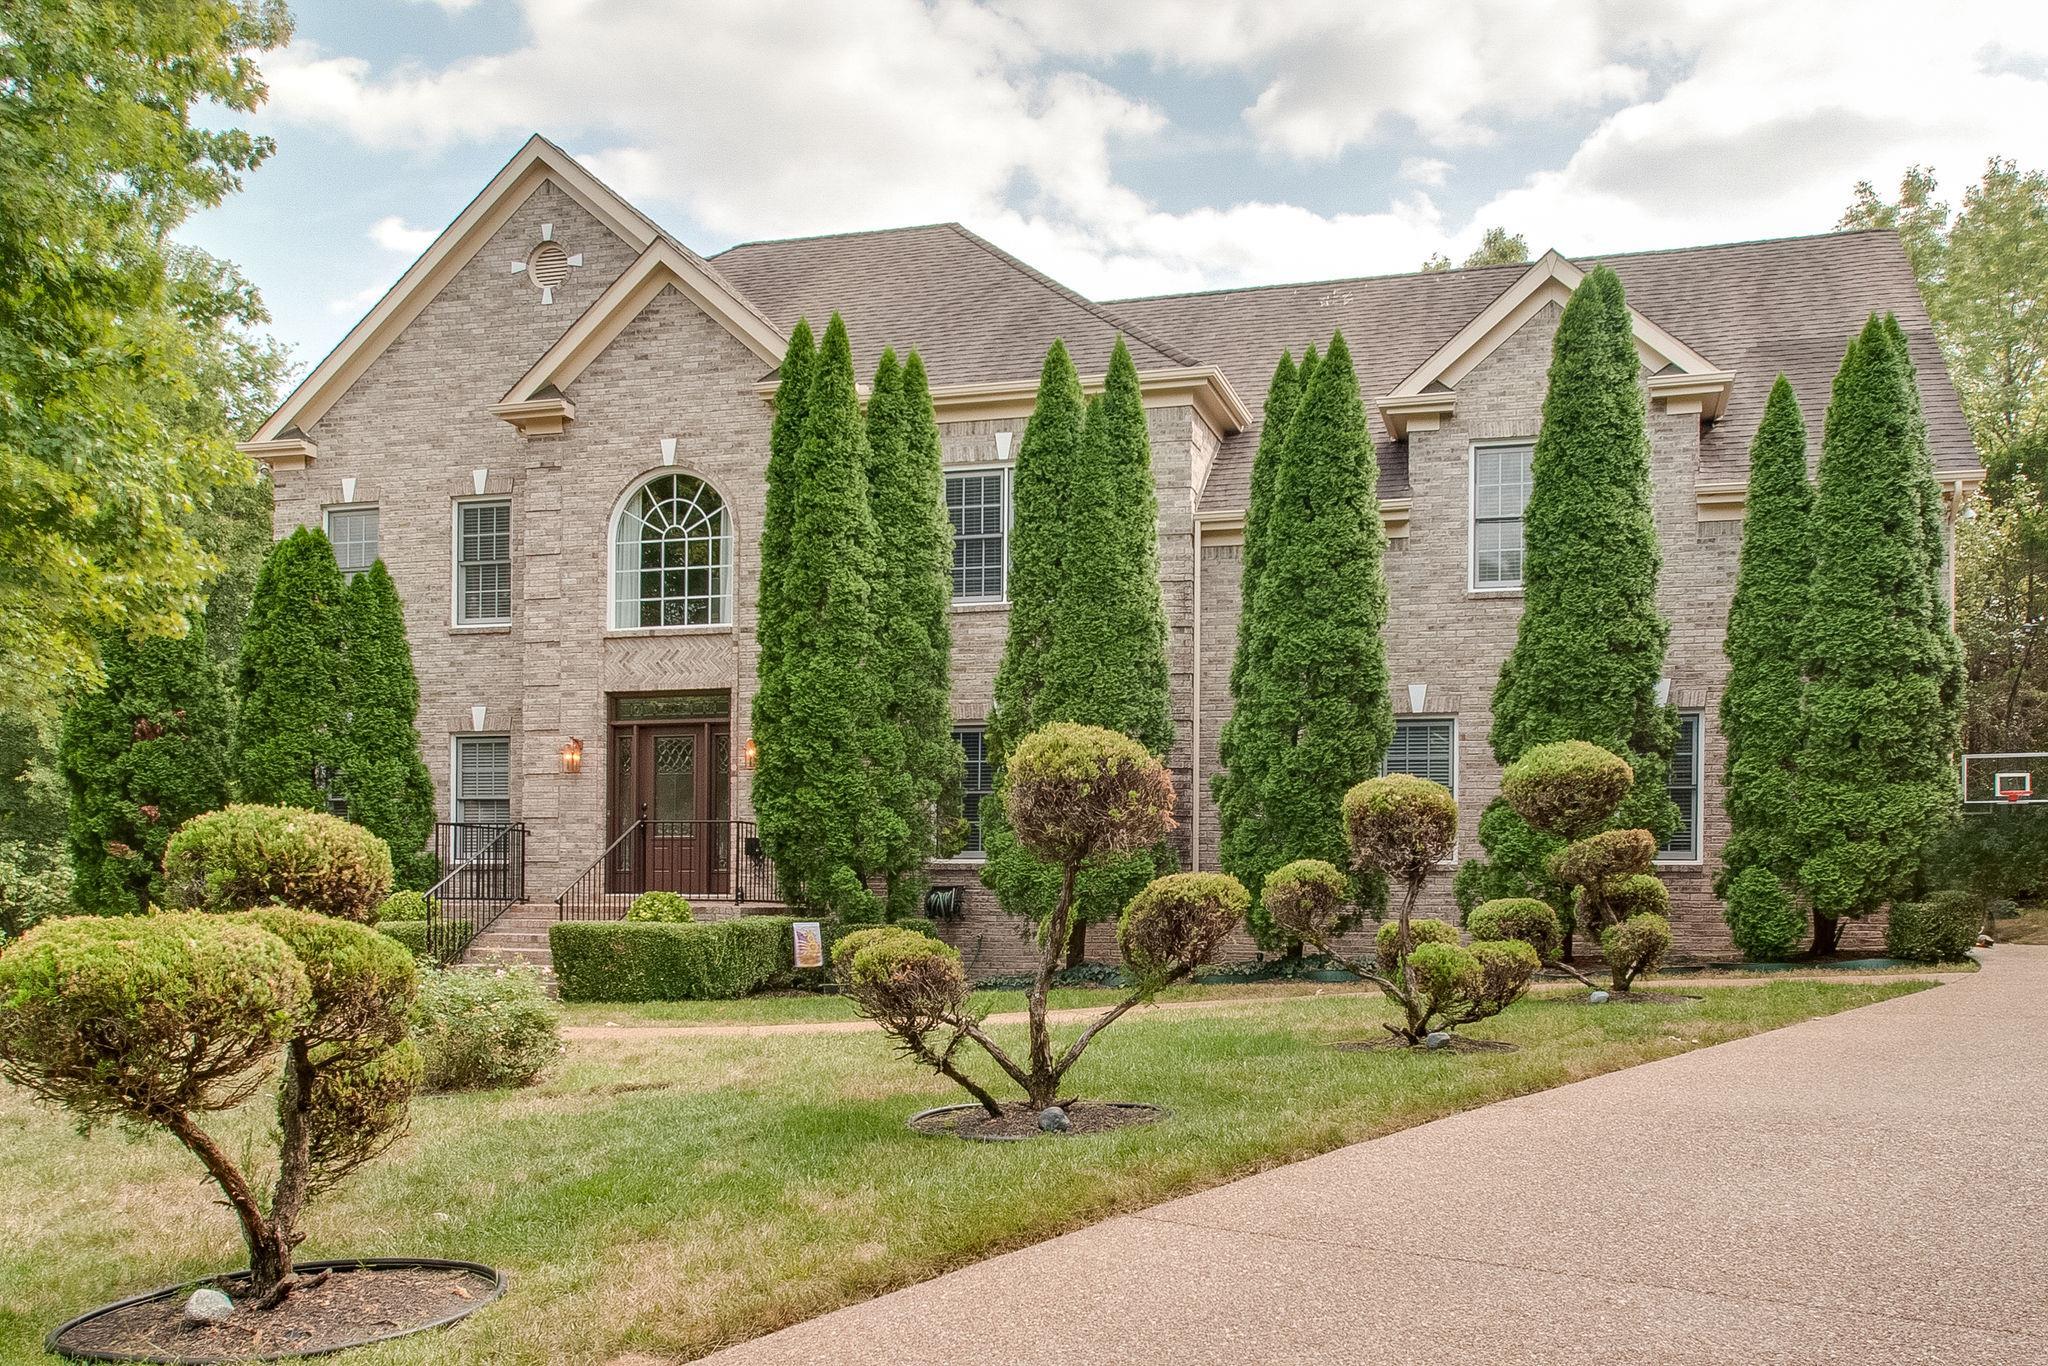 612 Banbury Pl, Brentwood, TN 37027 - Brentwood, TN real estate listing